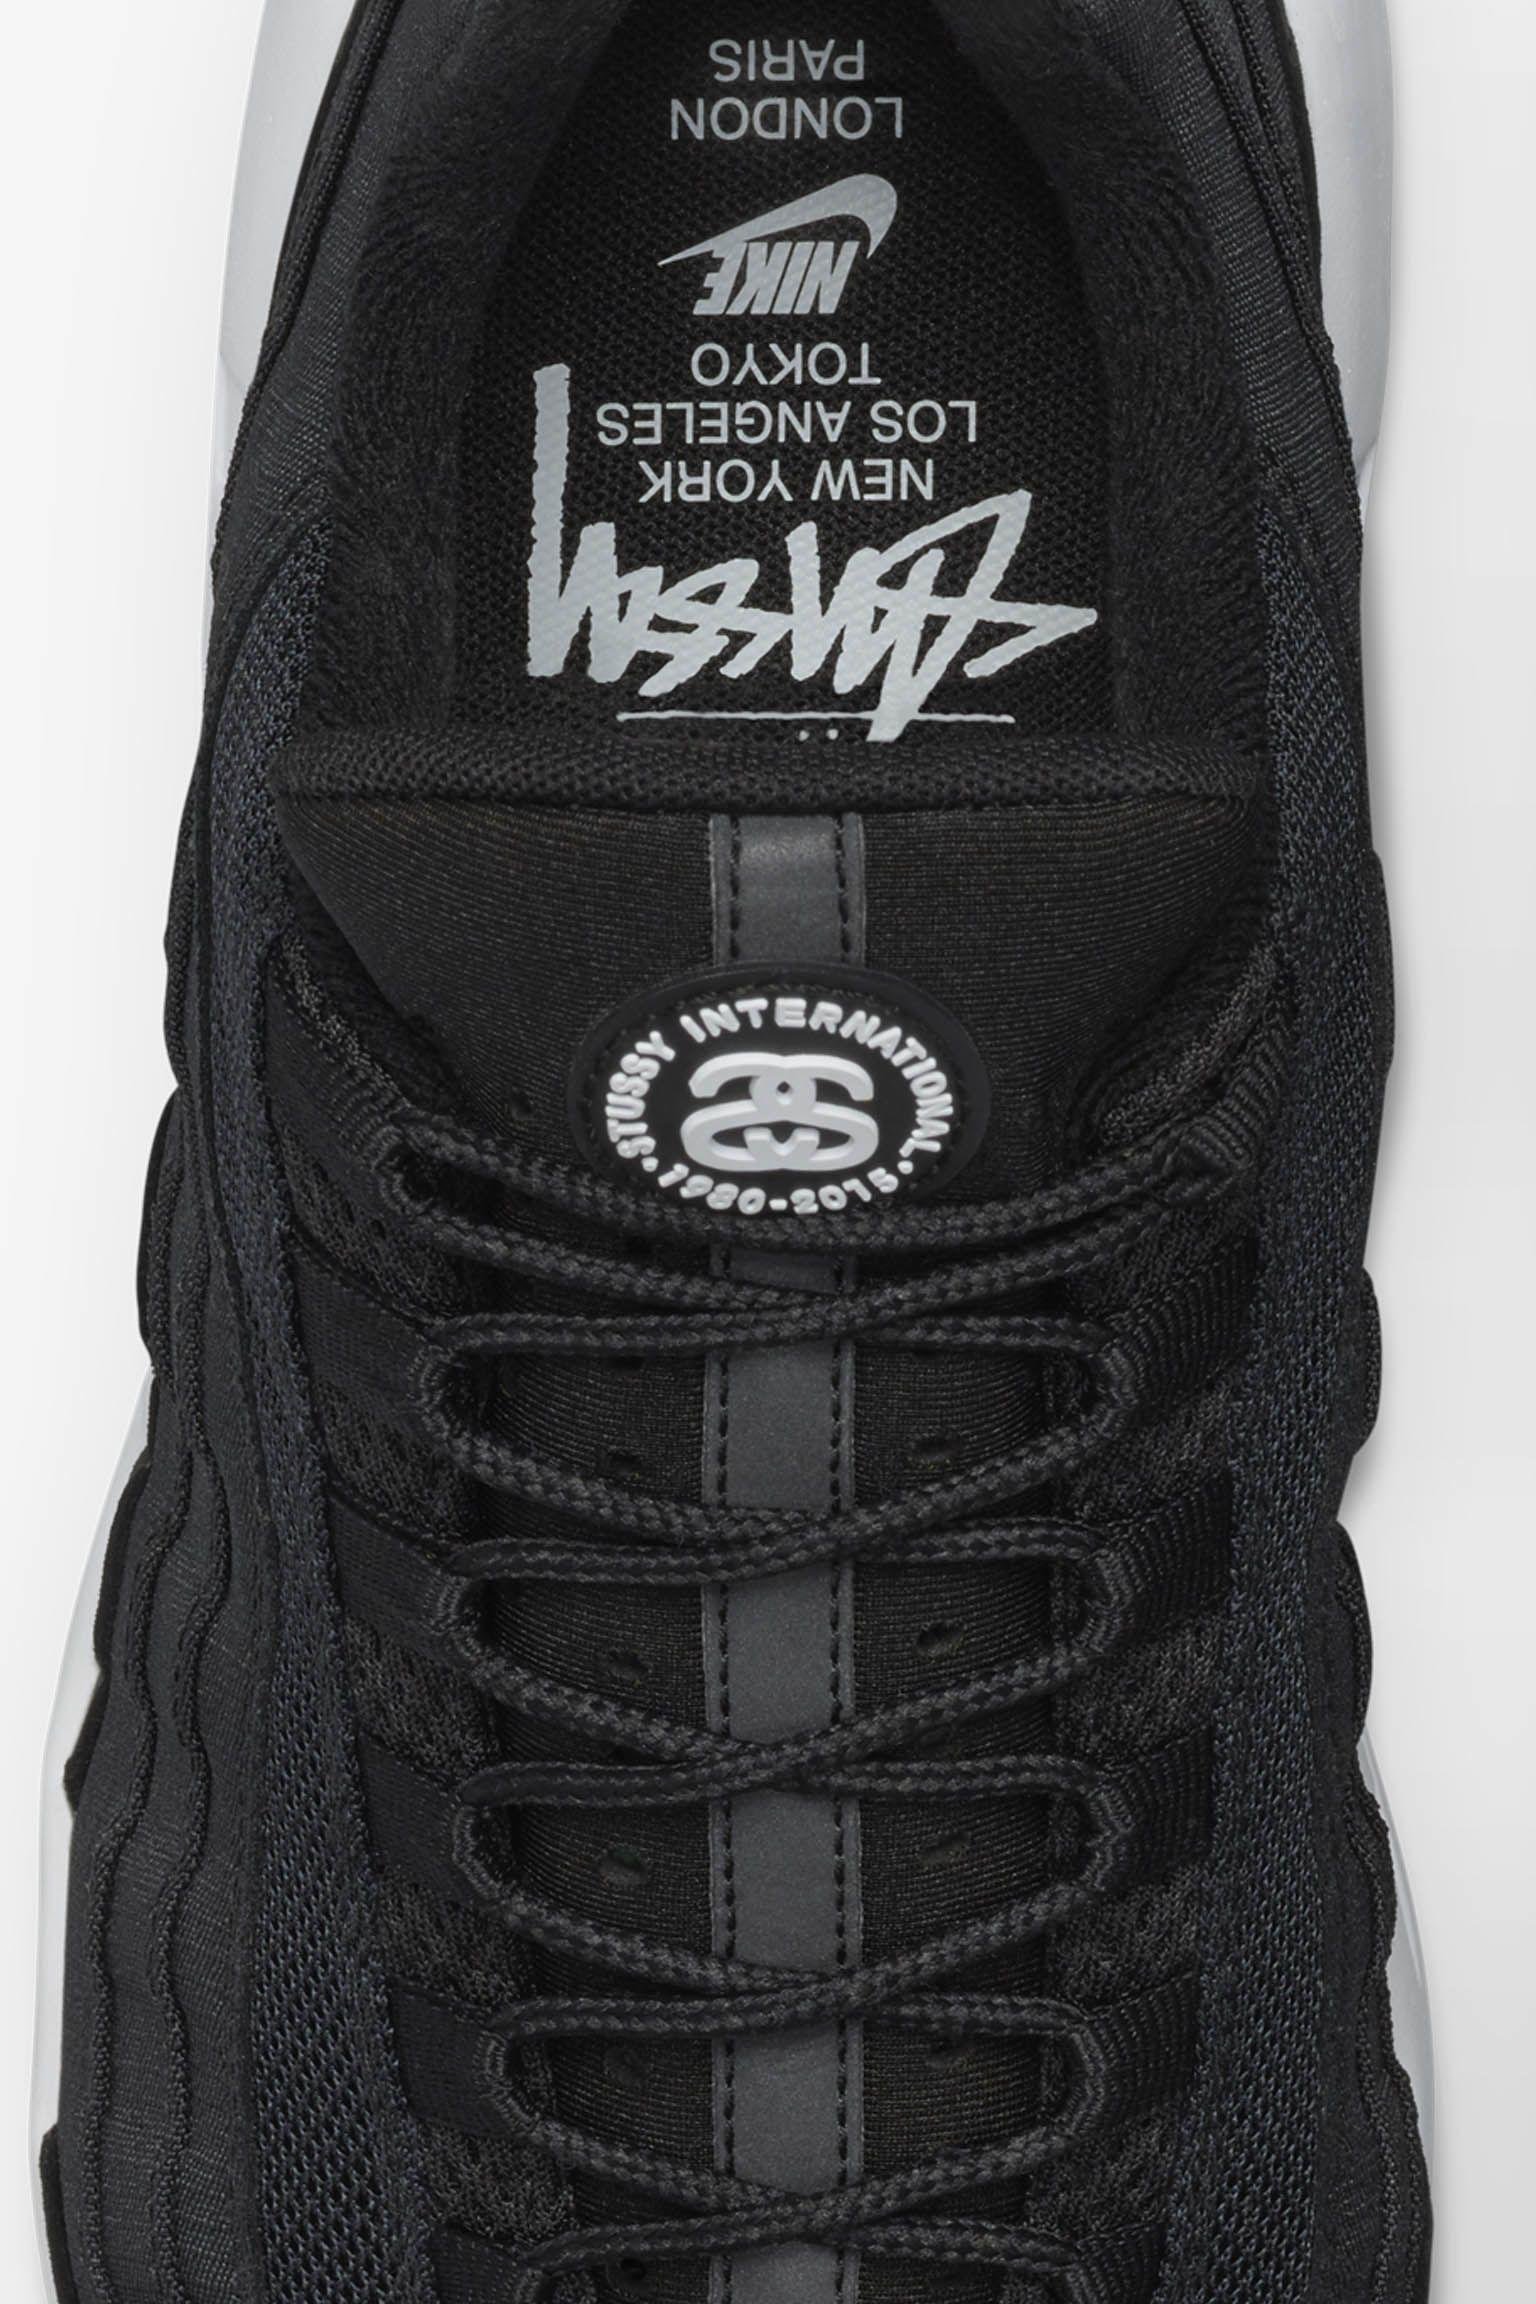 Nike Air Max 95 Stussy 'Black & White'